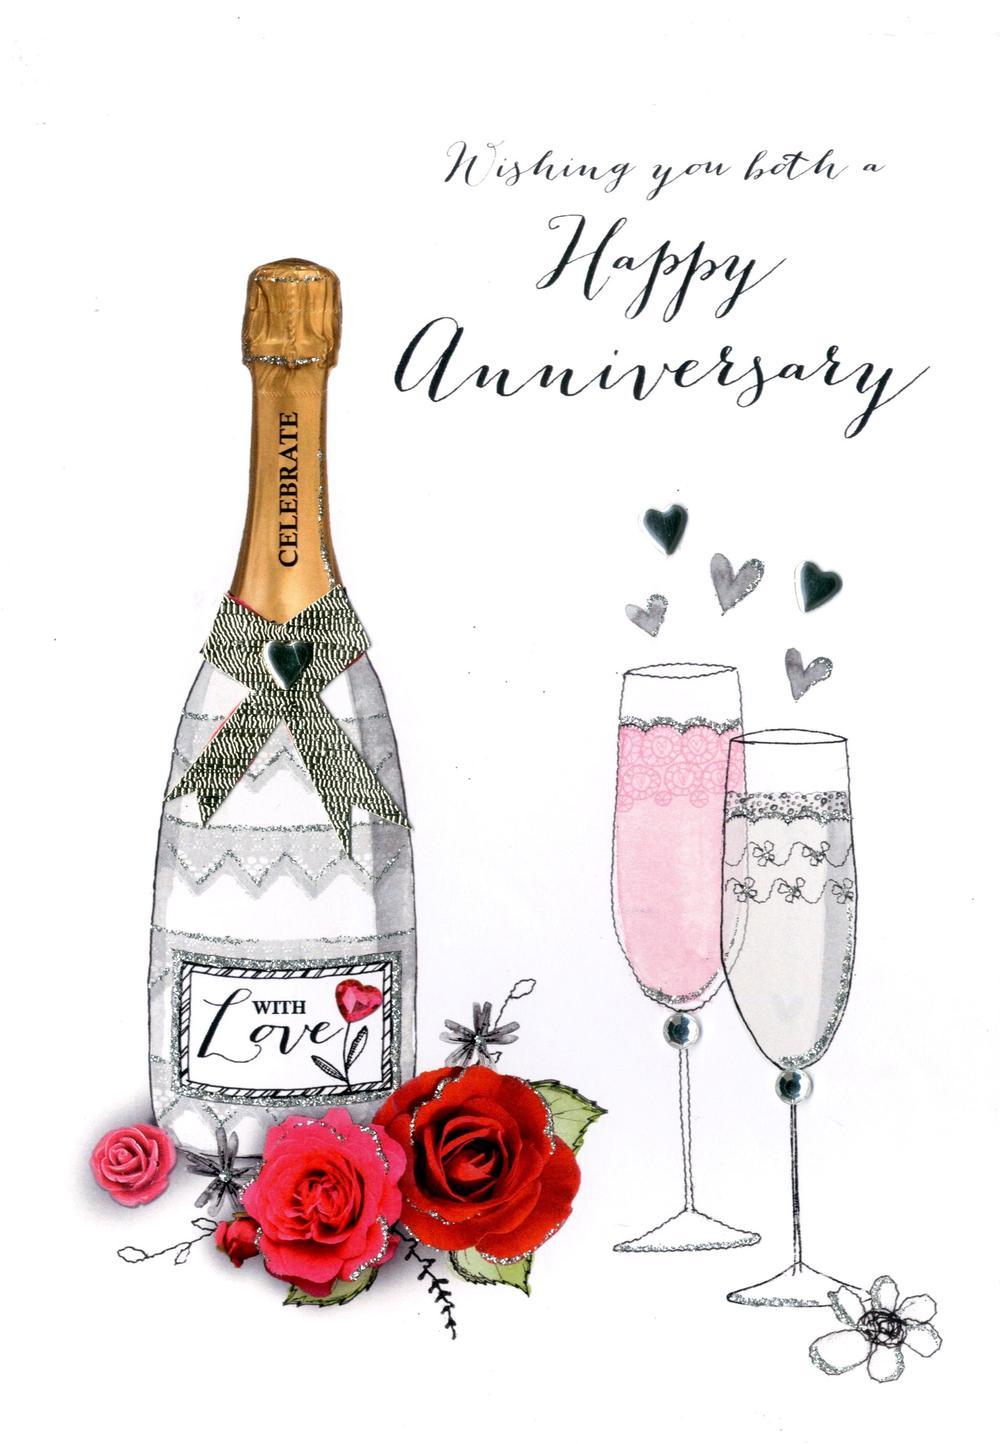 Wishing You Both Happy Anniversary Greeting Card